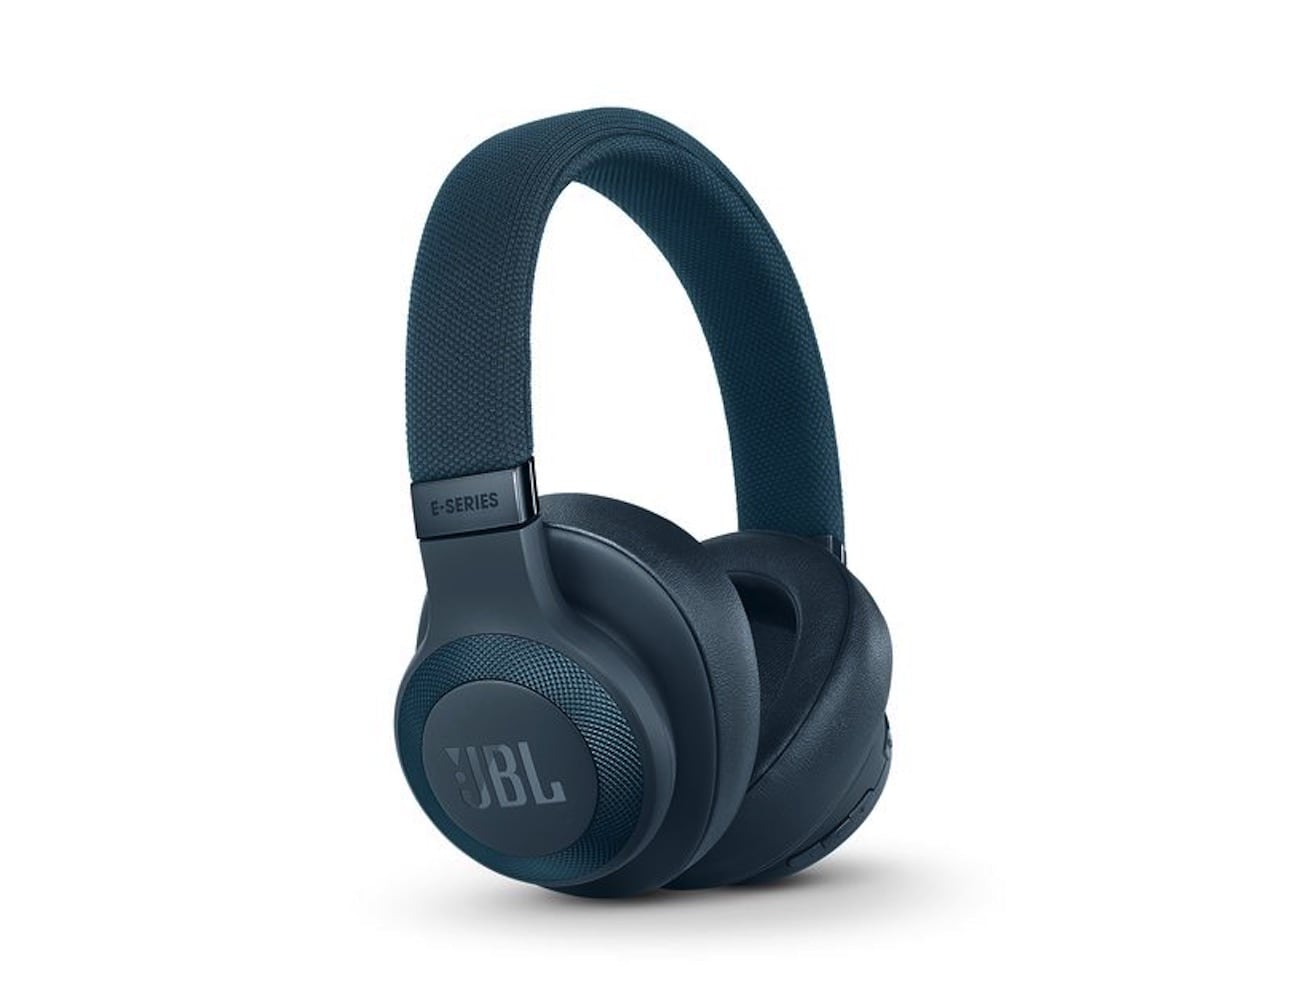 jbl e65 over ear nc headphones gadget flow. Black Bedroom Furniture Sets. Home Design Ideas